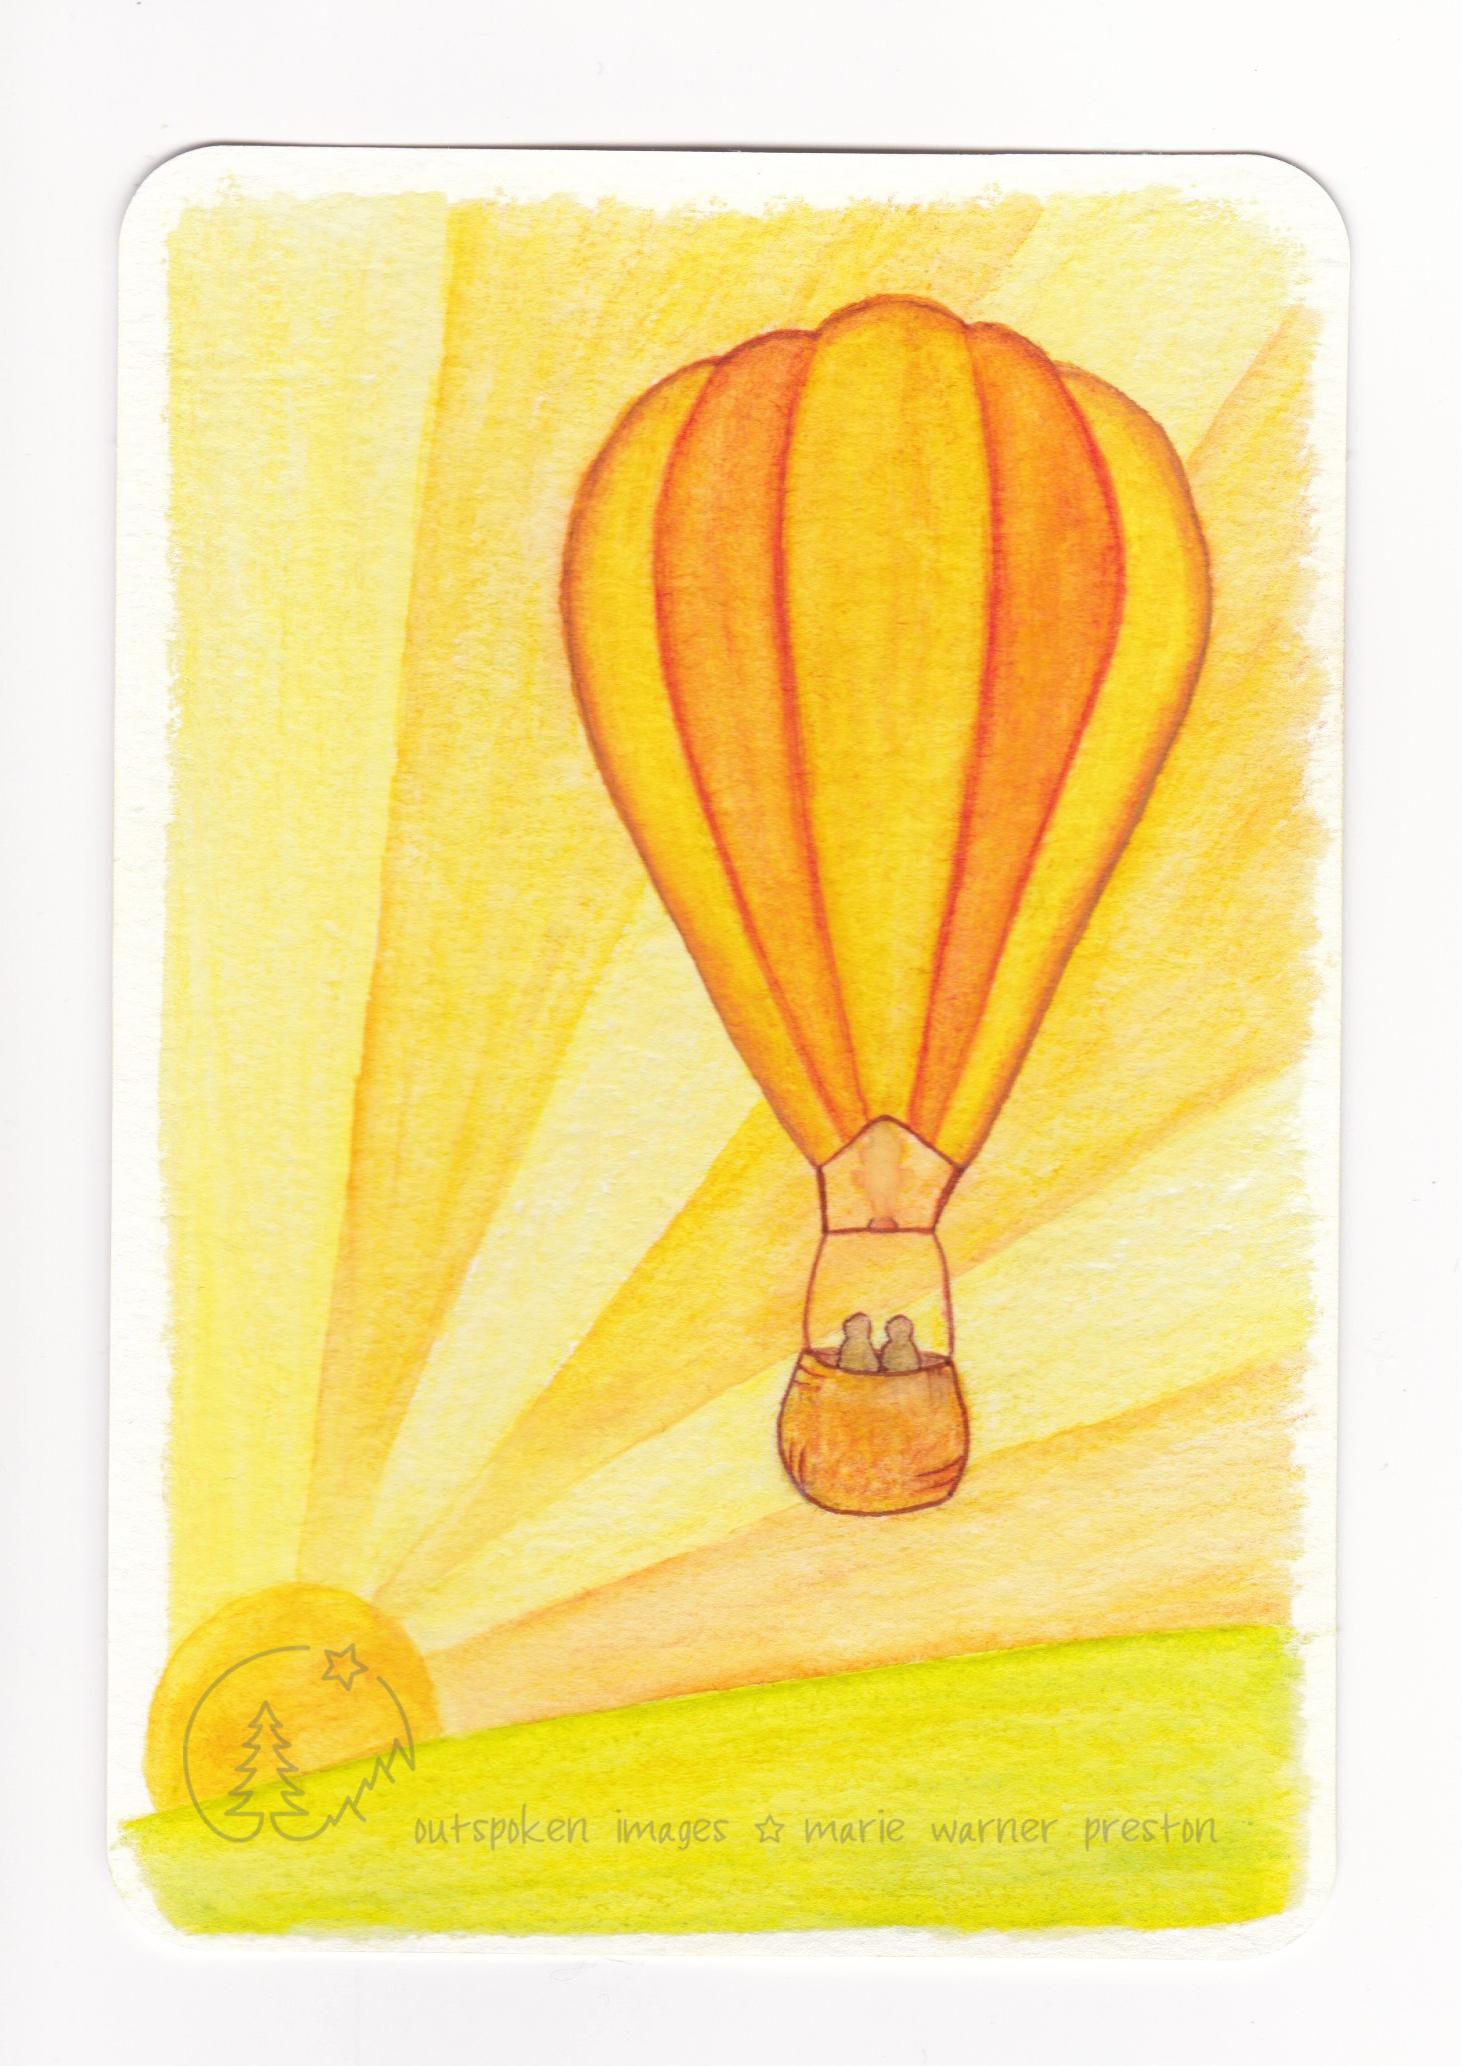 orange hot air balloon against orange sun rays. Orange Arrival. ©2021 Outspoken Images by Marie Warner Preston